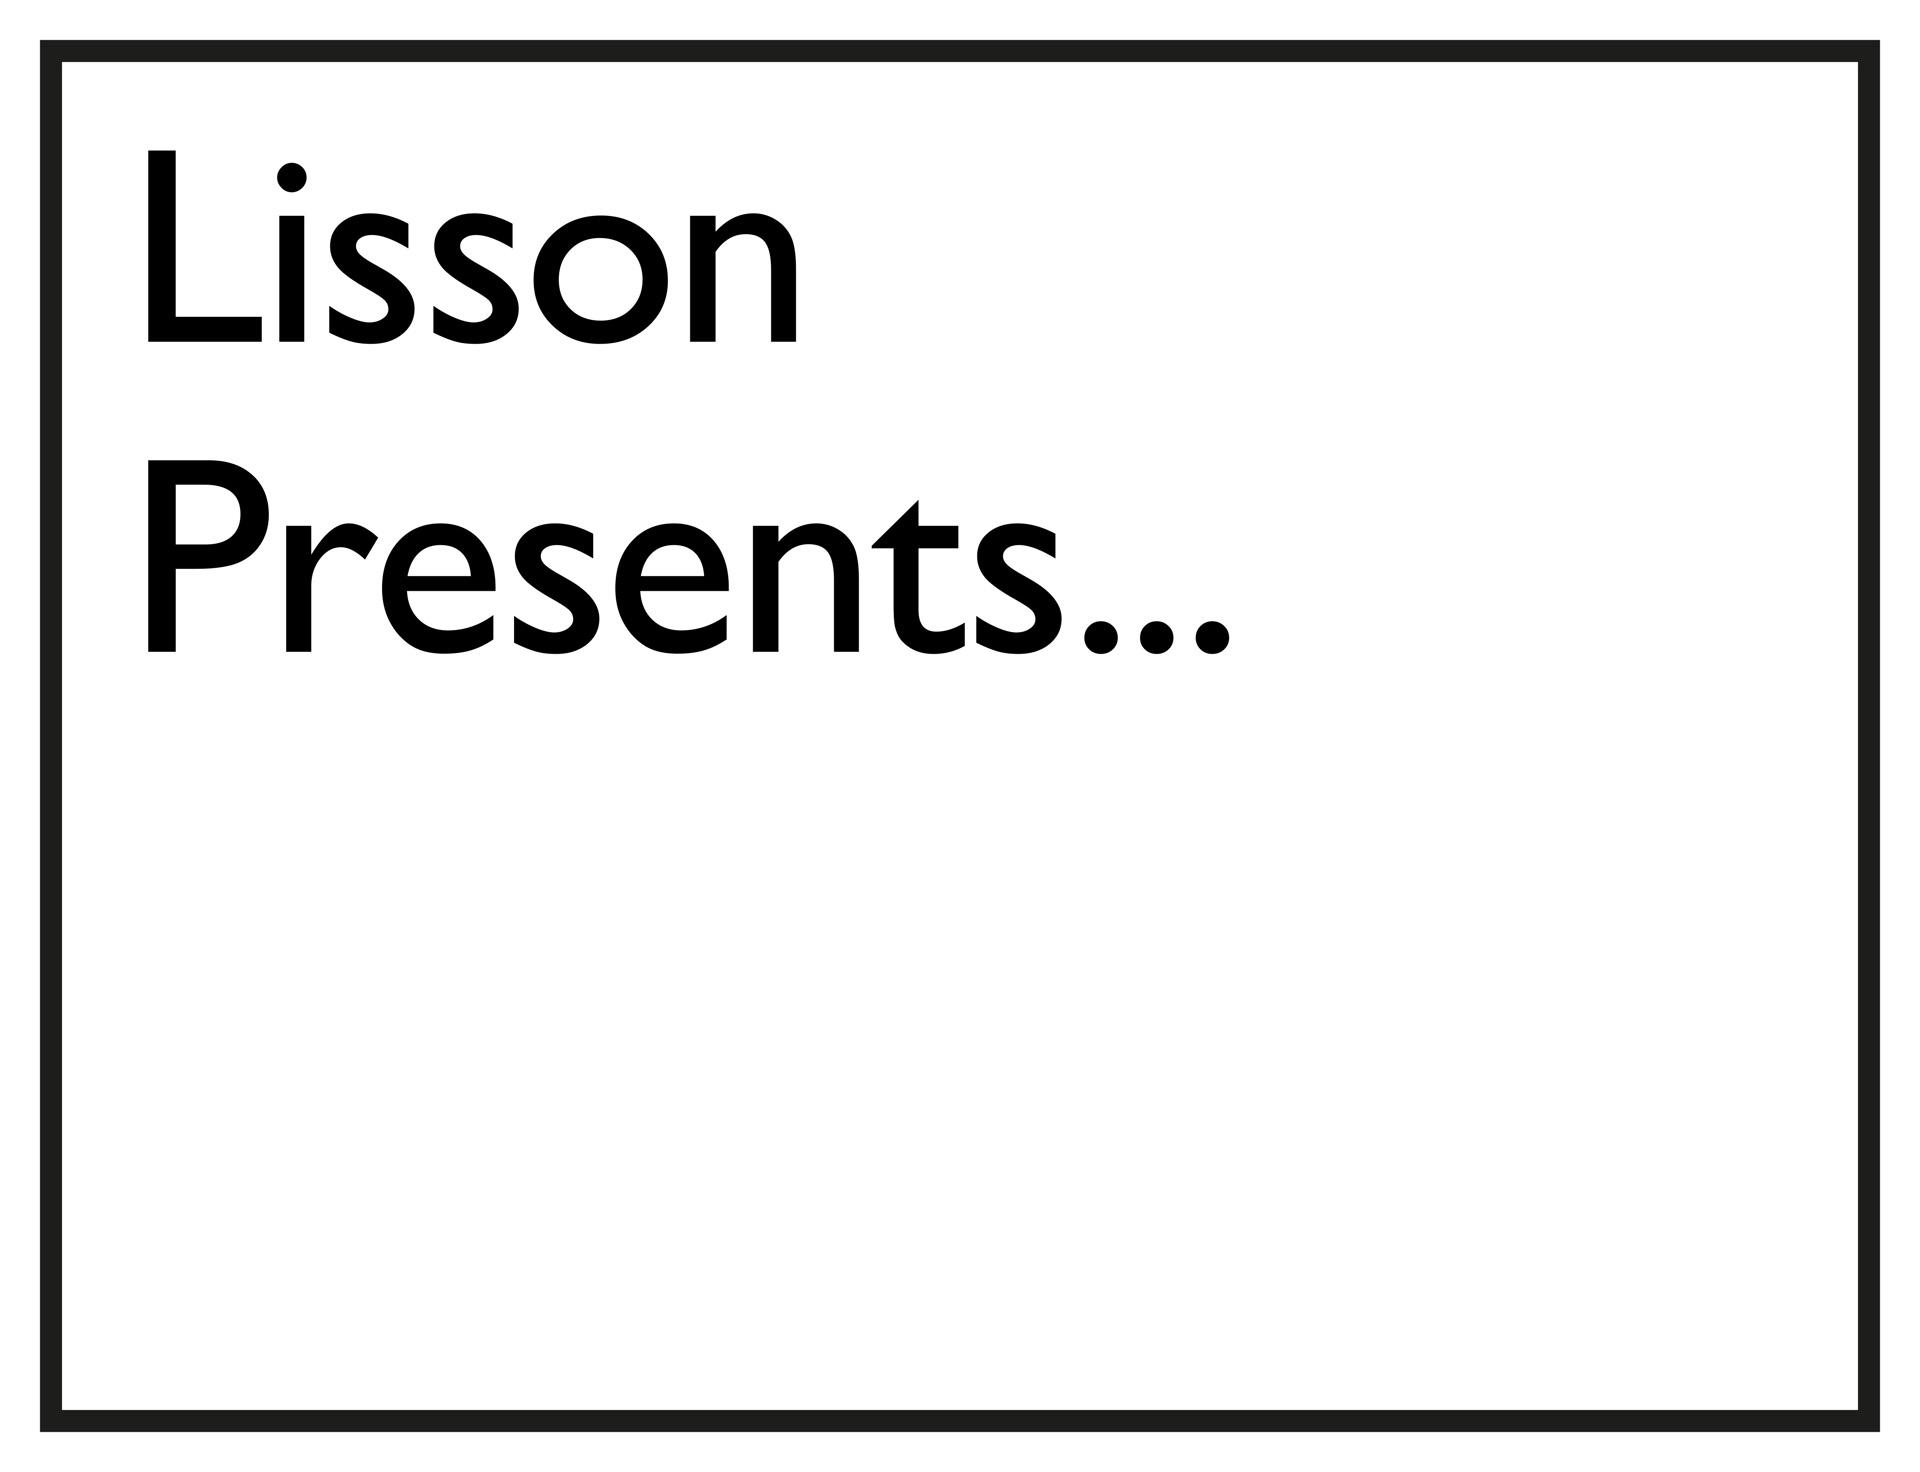 Lisson Presents...